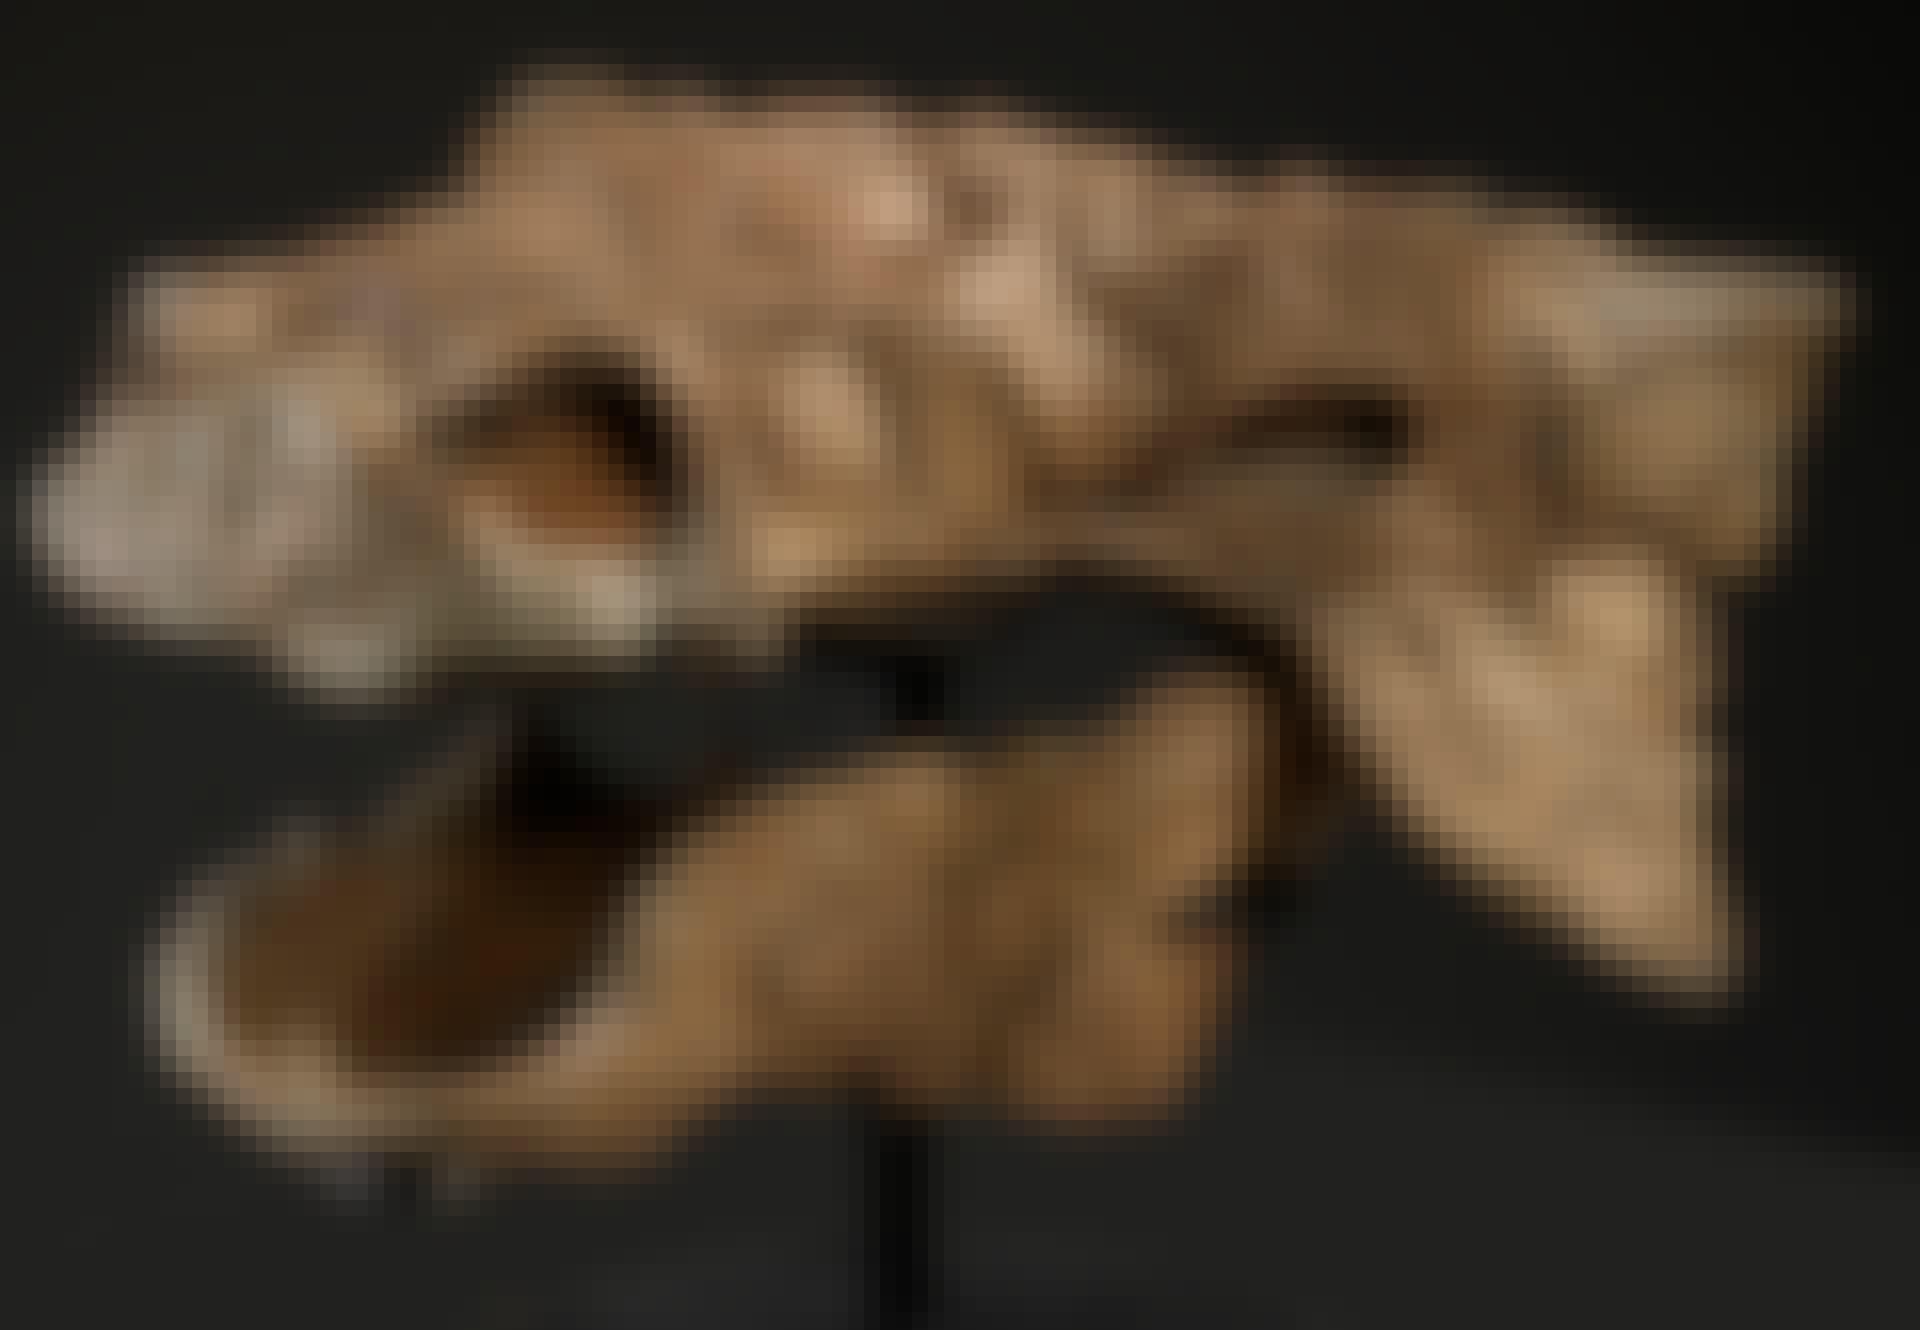 Zuul crurivastator